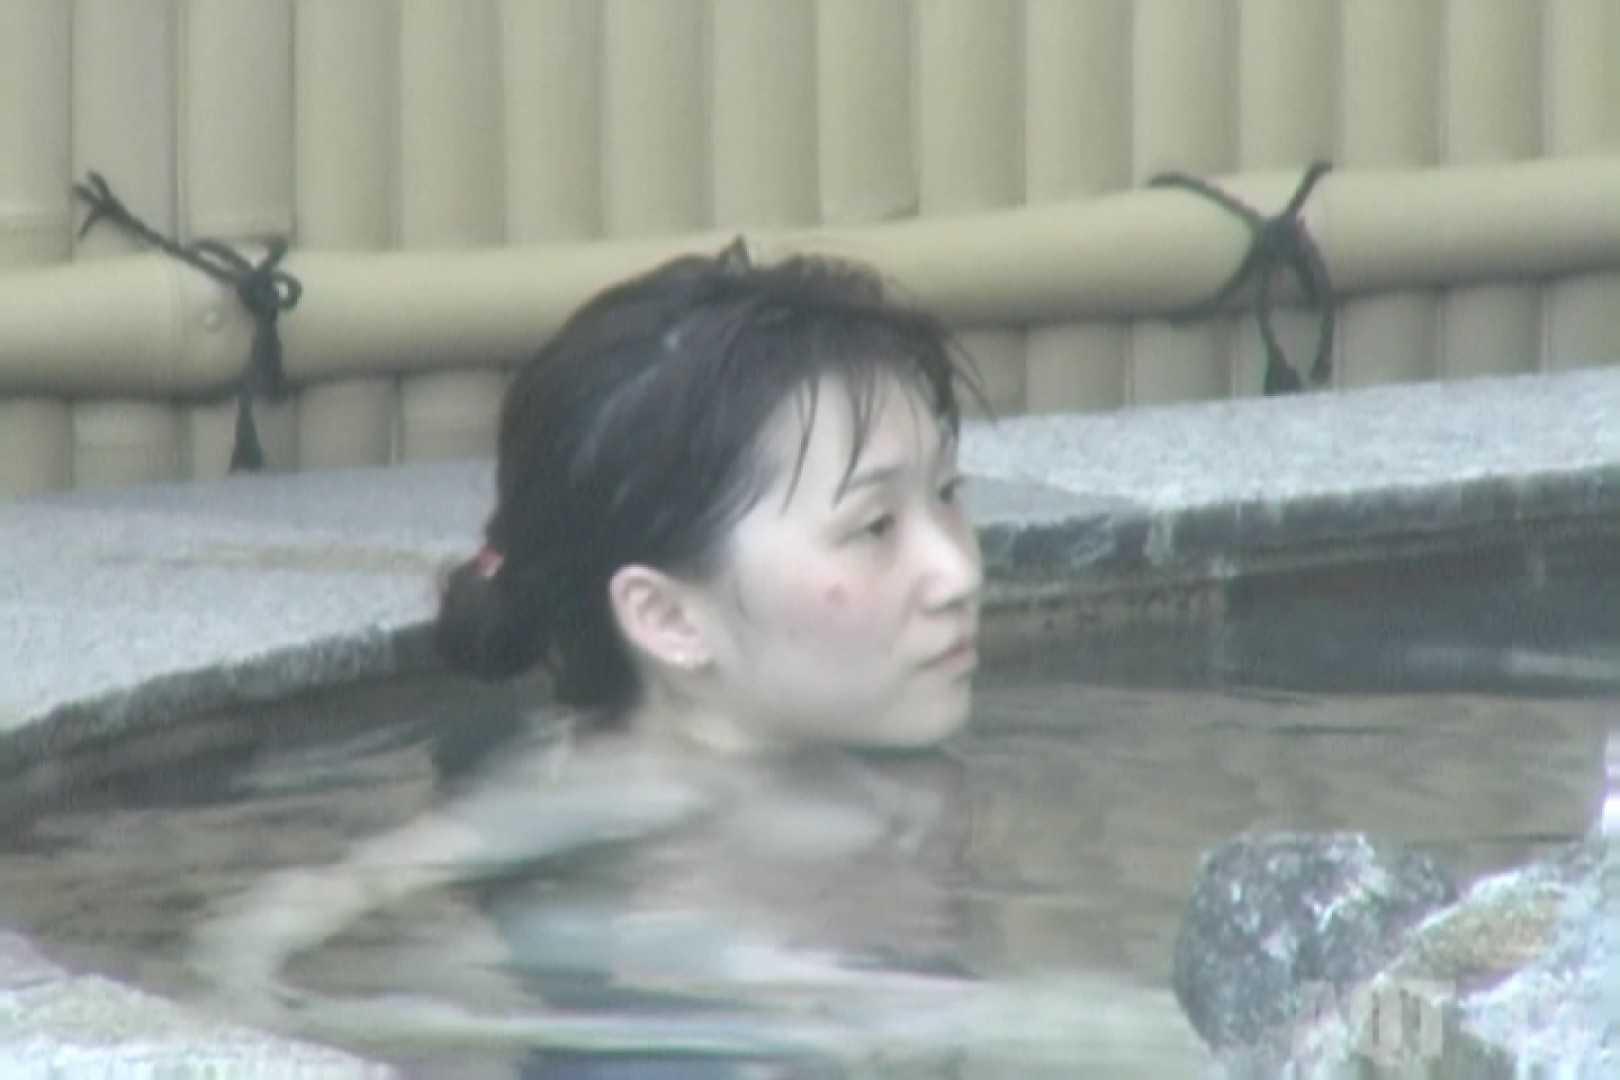 Aquaな露天風呂Vol.831 露天   HなOL  99pic 58